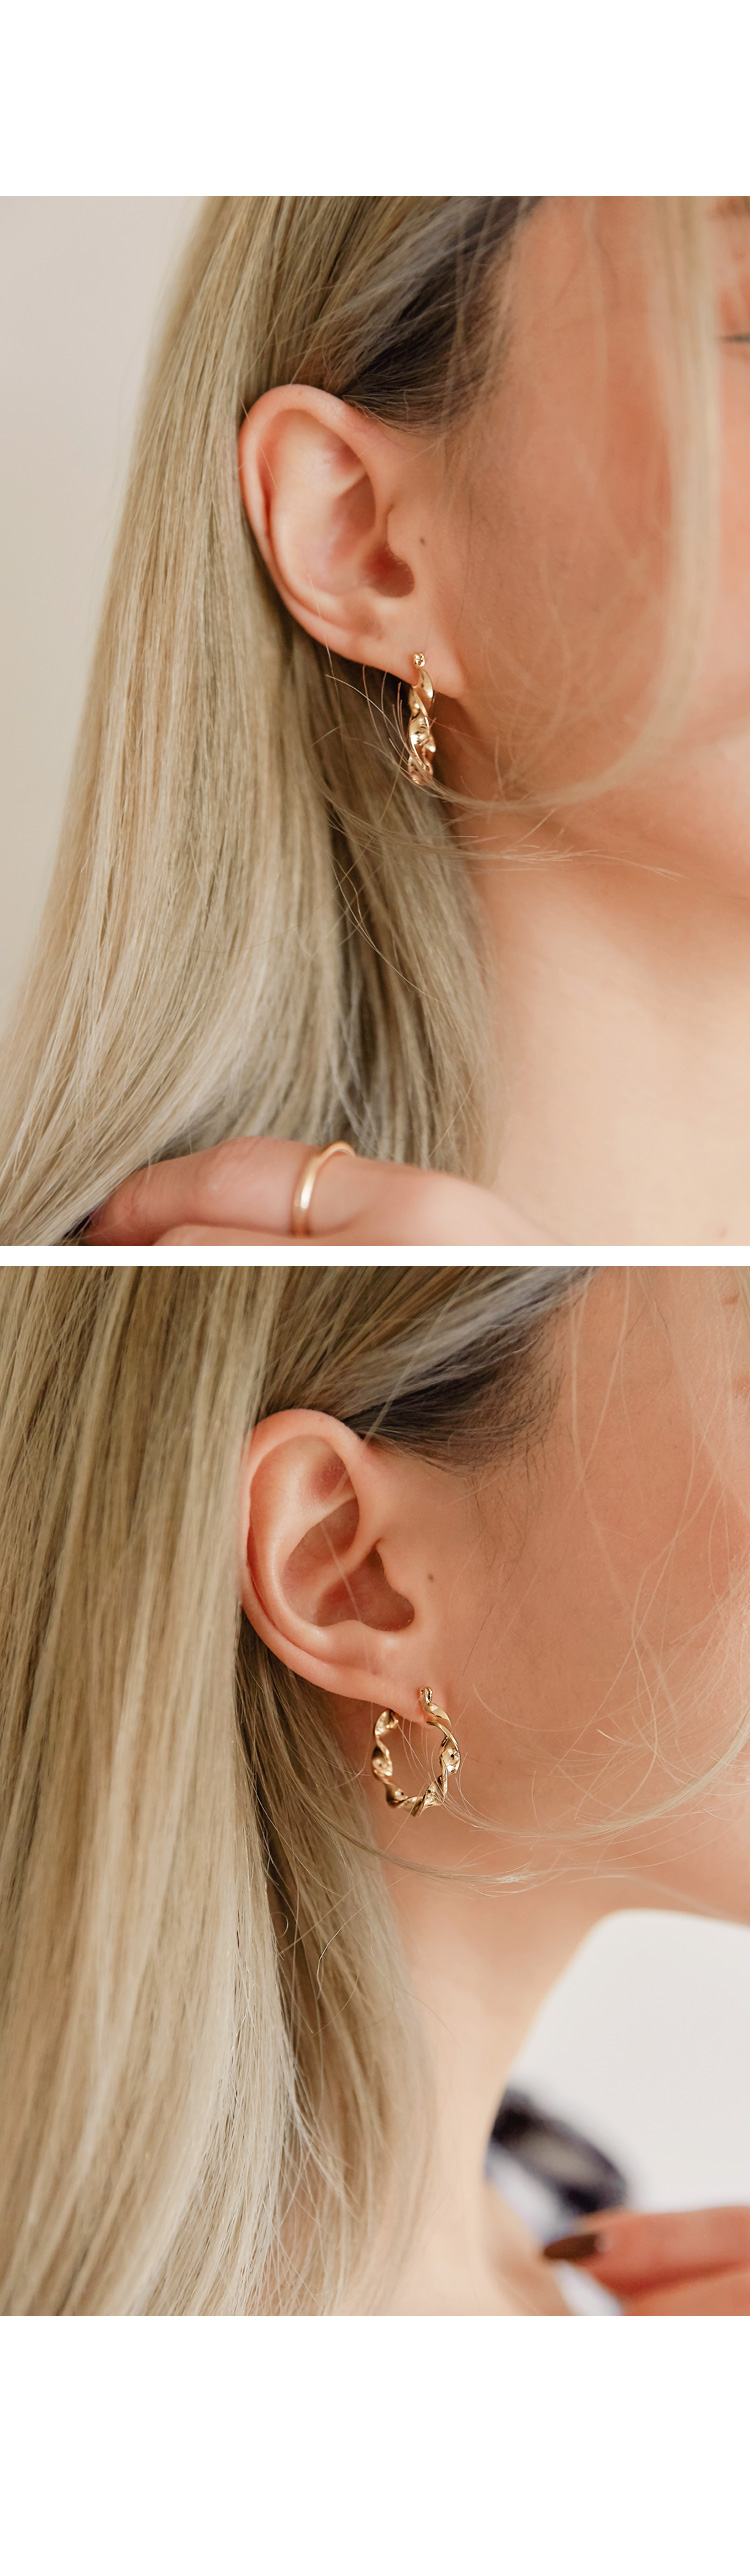 LENISION TWIST RING EARRING